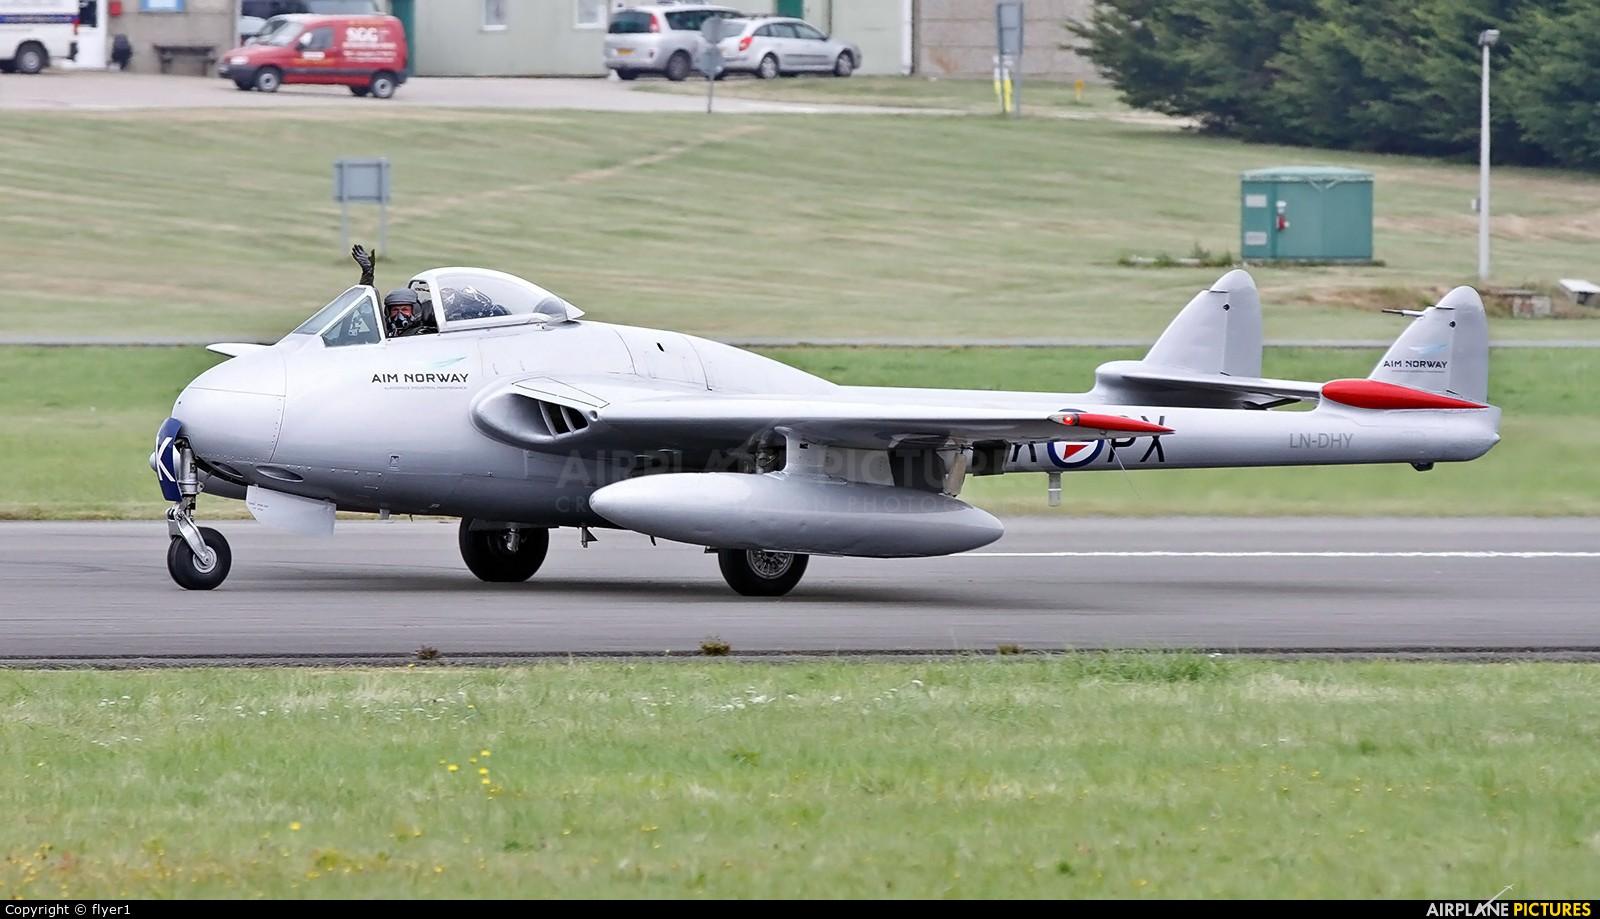 Private LN-DHY aircraft at Dunsfold